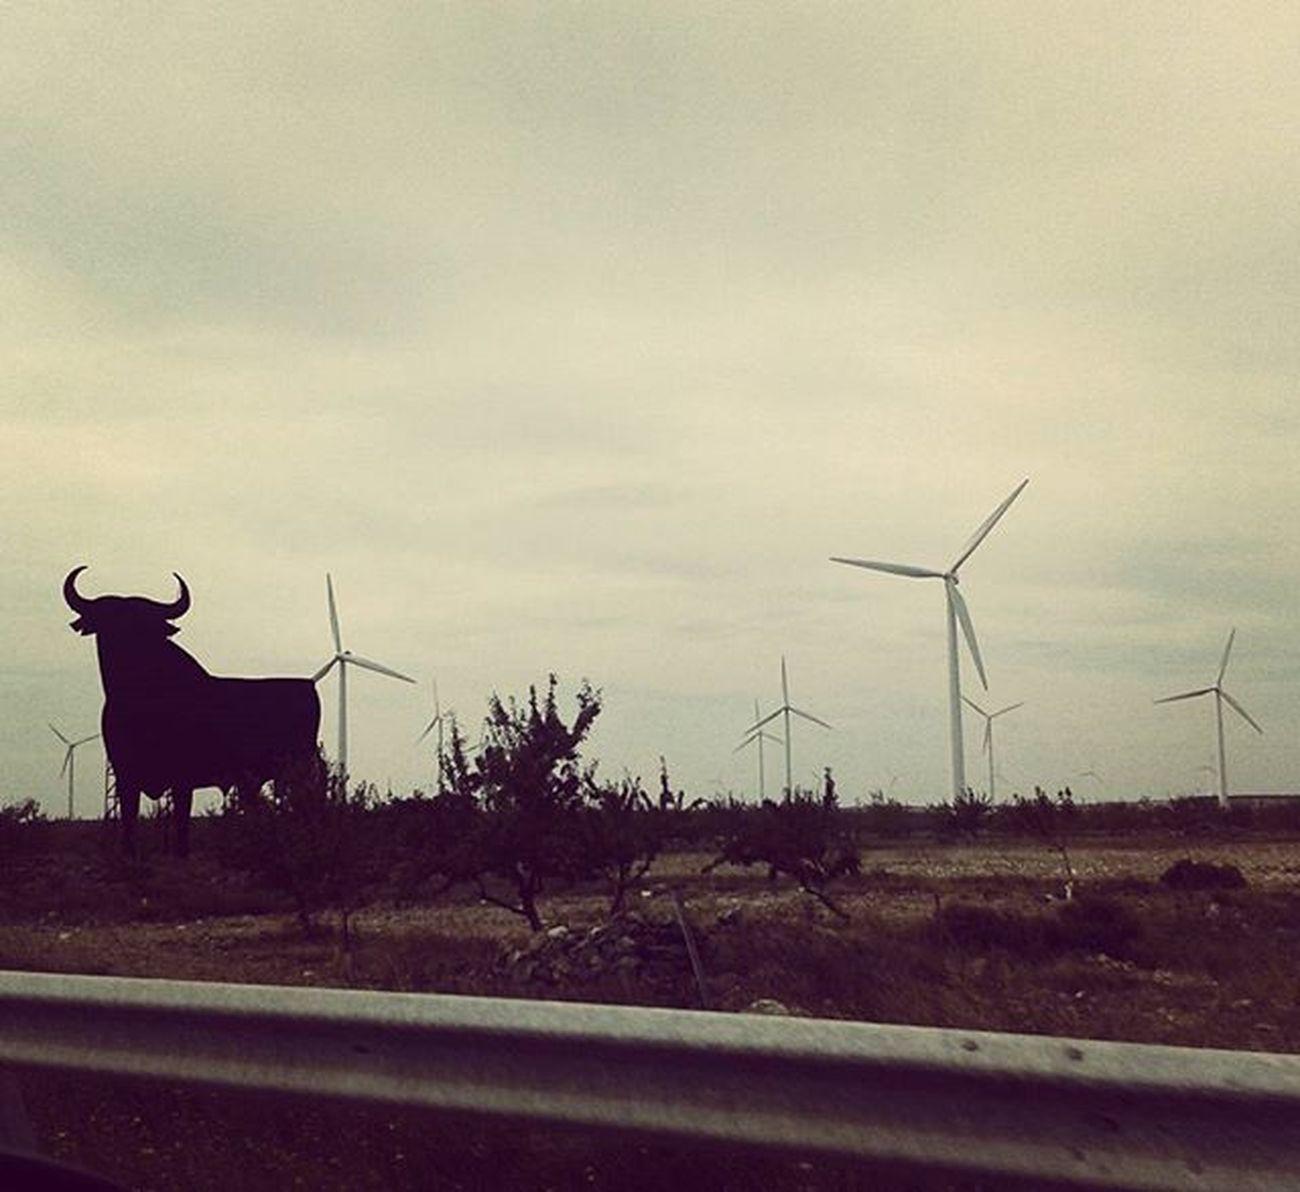 In the same lanscape. The world needs more Windmills & less artificial bulls. Let's say no to Bullfighting & yes to the Ethical Treatment of Animals Sendbacksaturday Toros Corrida Noalacorridadetoros Isf Isfoundation @iansomerhalder @iamnikkireed Sustainability Compassion Ecology Ecosystem  Earth Sustainableenergy Medioambiente SPAIN España Osborne Vino Vinoosborne Torodeosborne